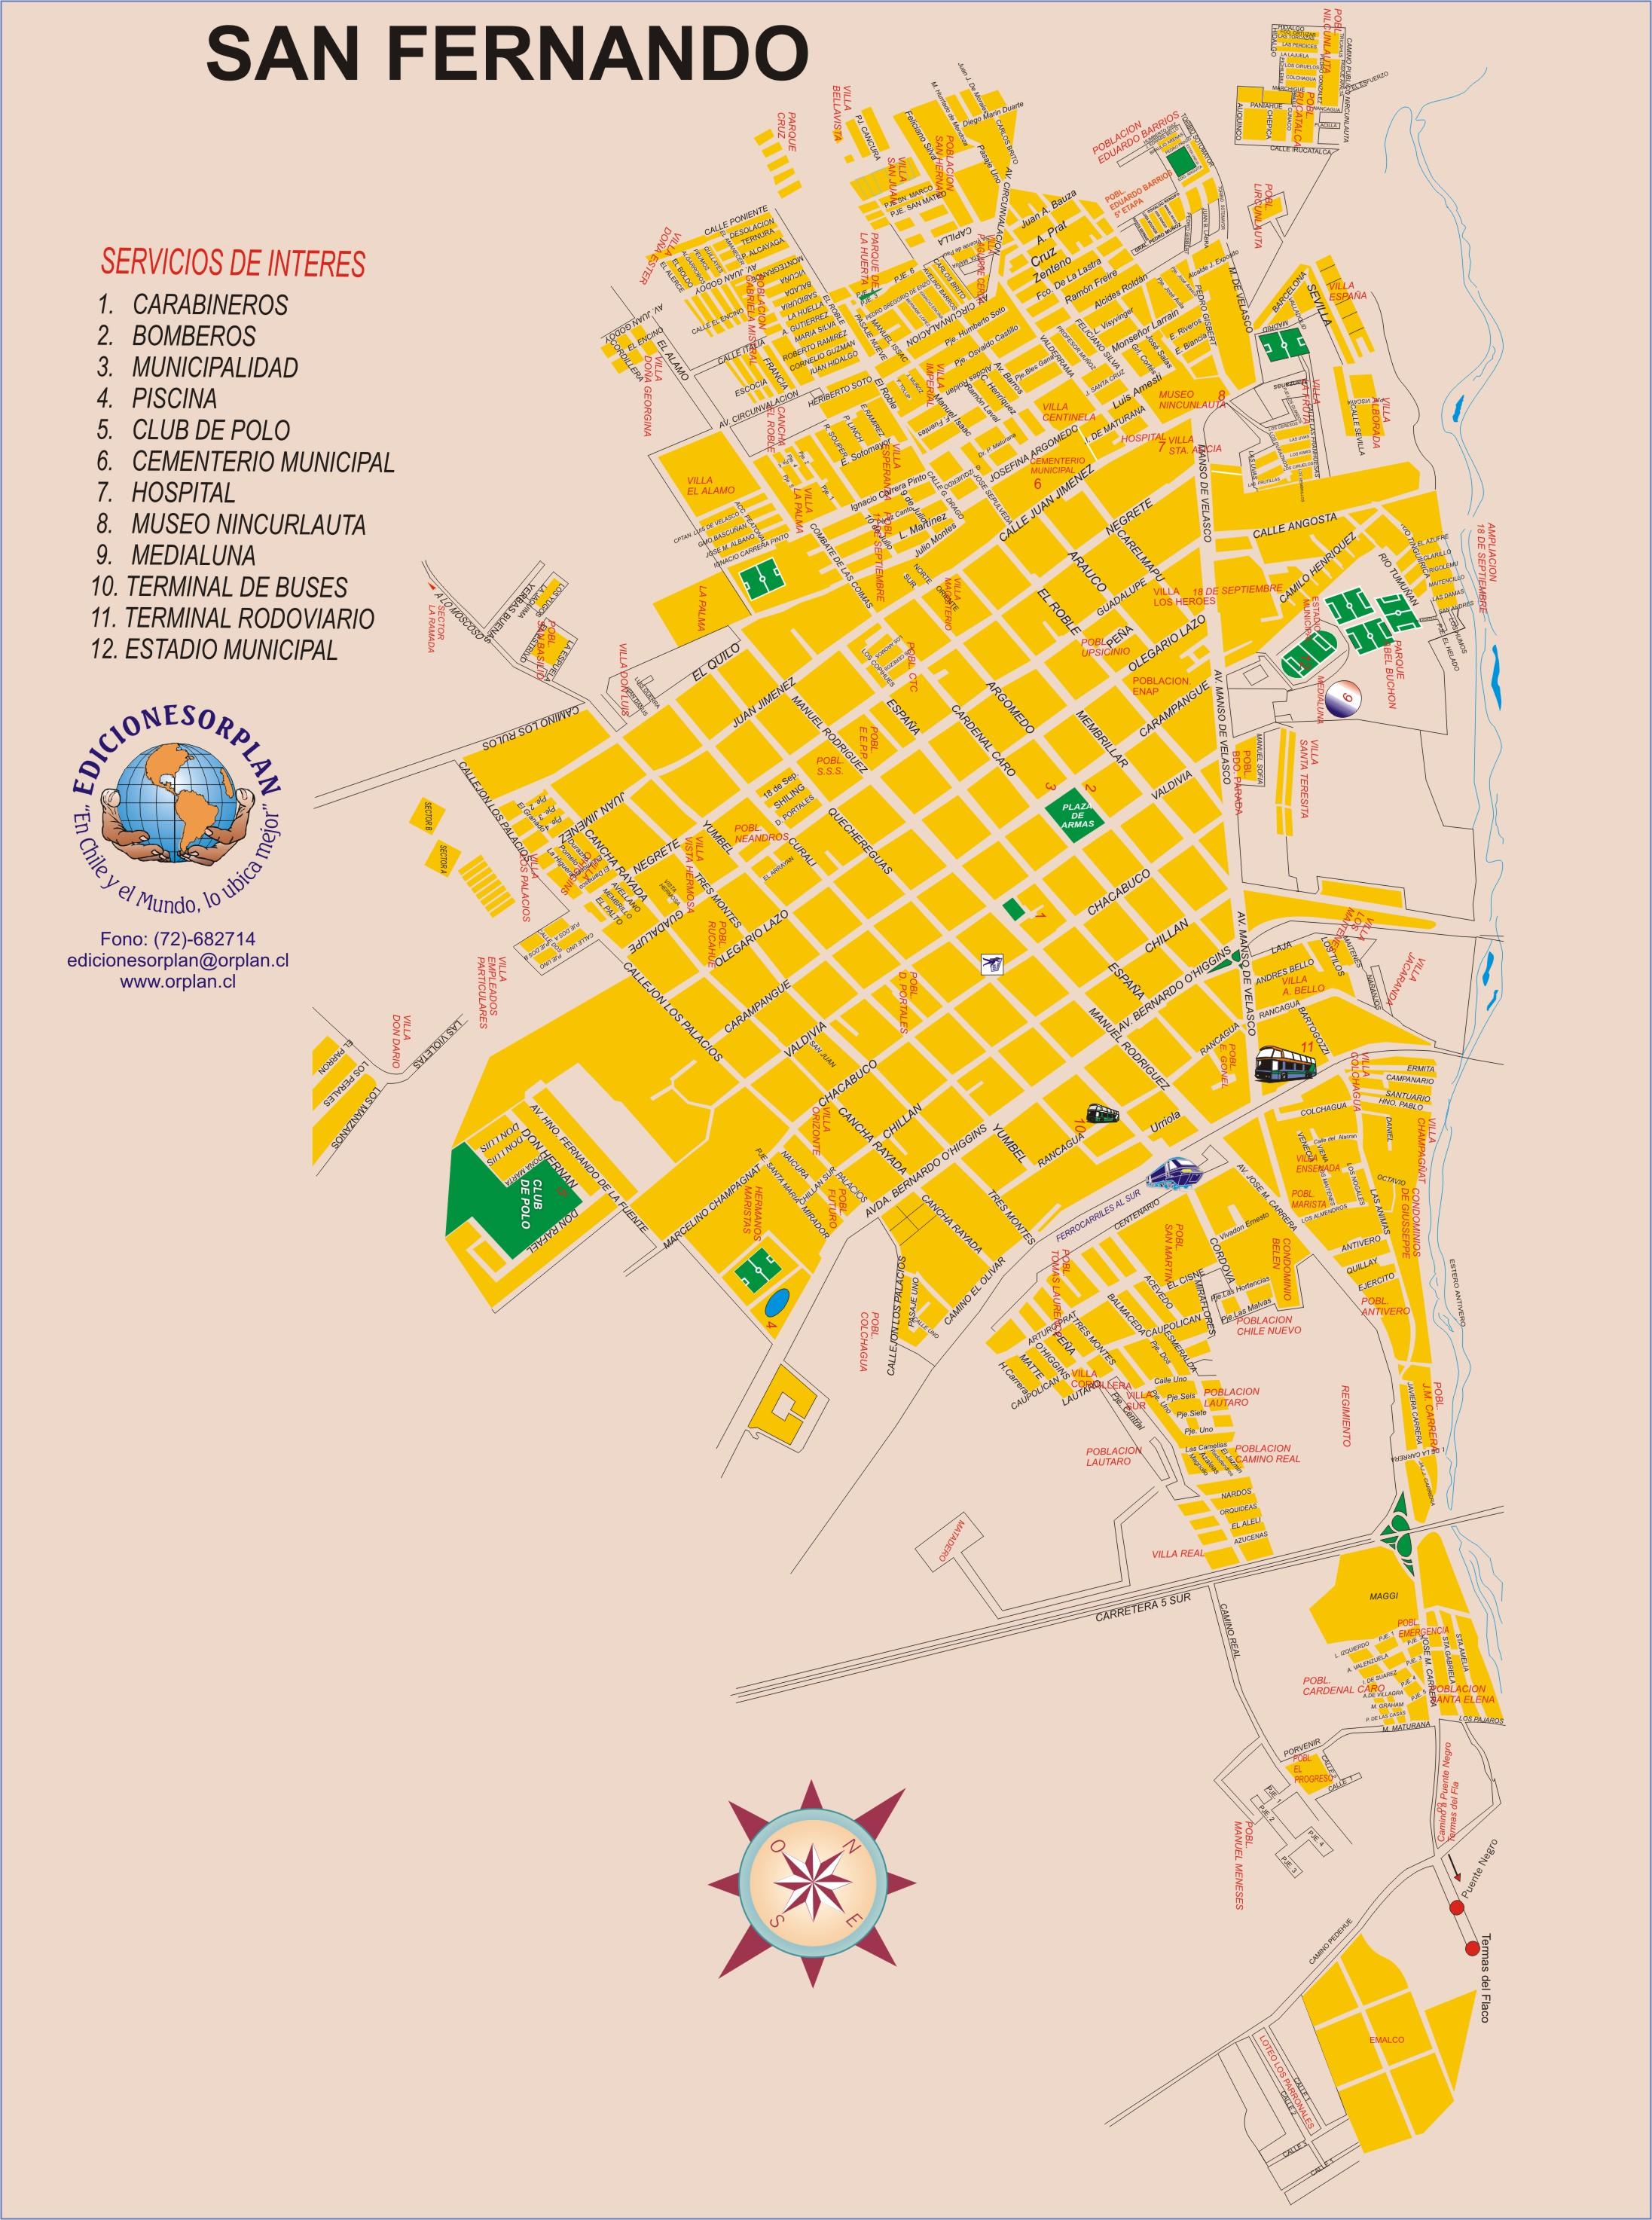 San Fernando Tourist Map San Fernando Chile mappery